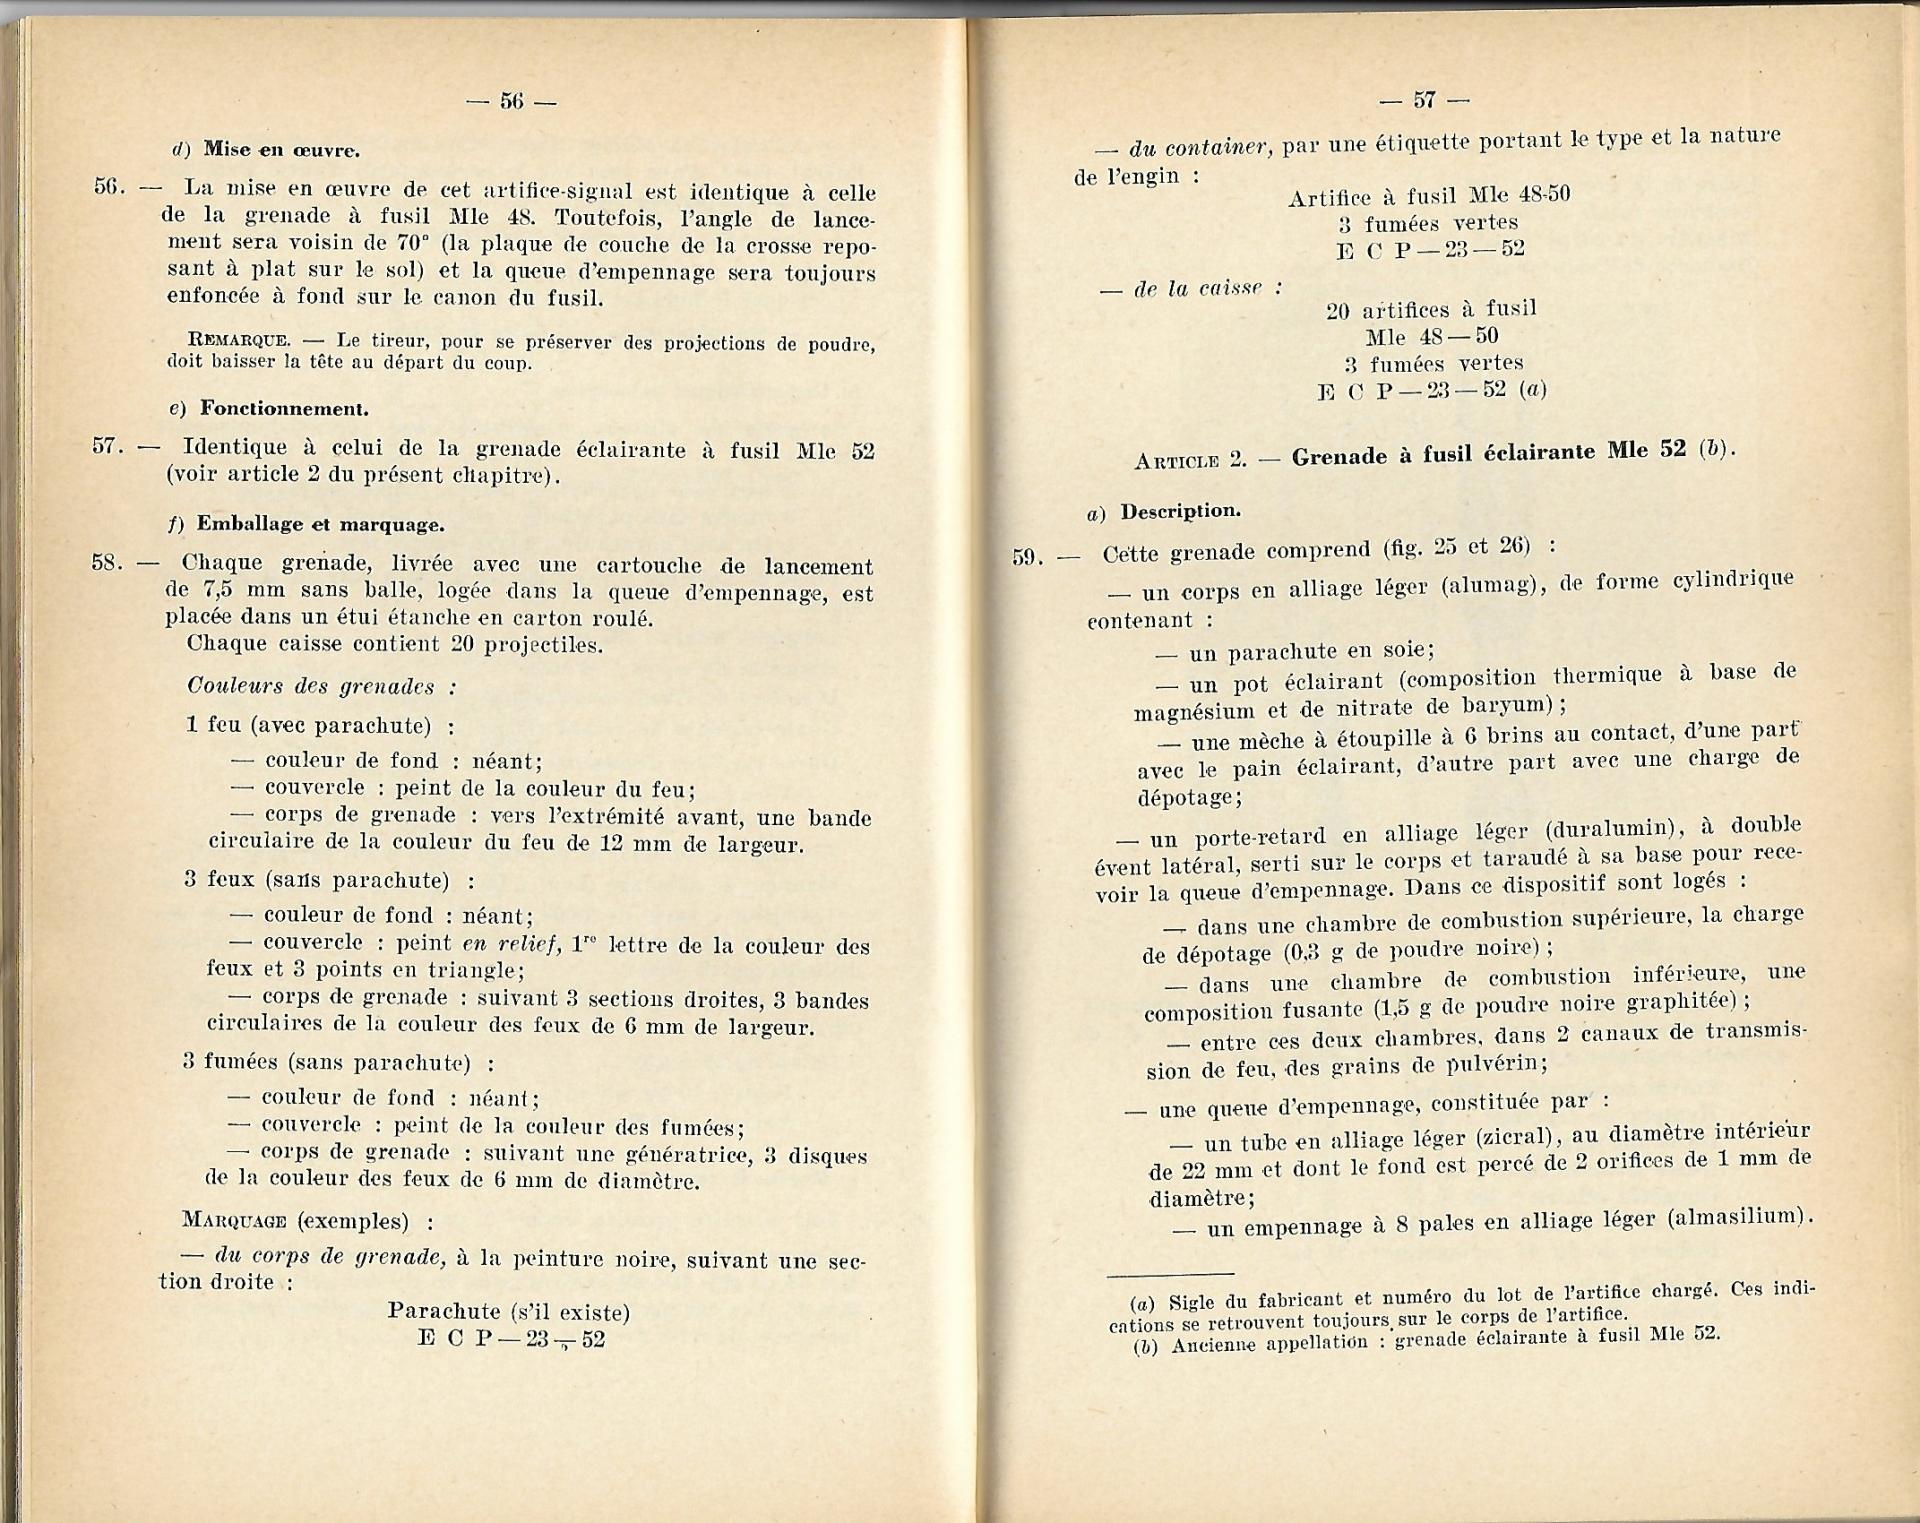 Grenades a fusil 1957 p56 57